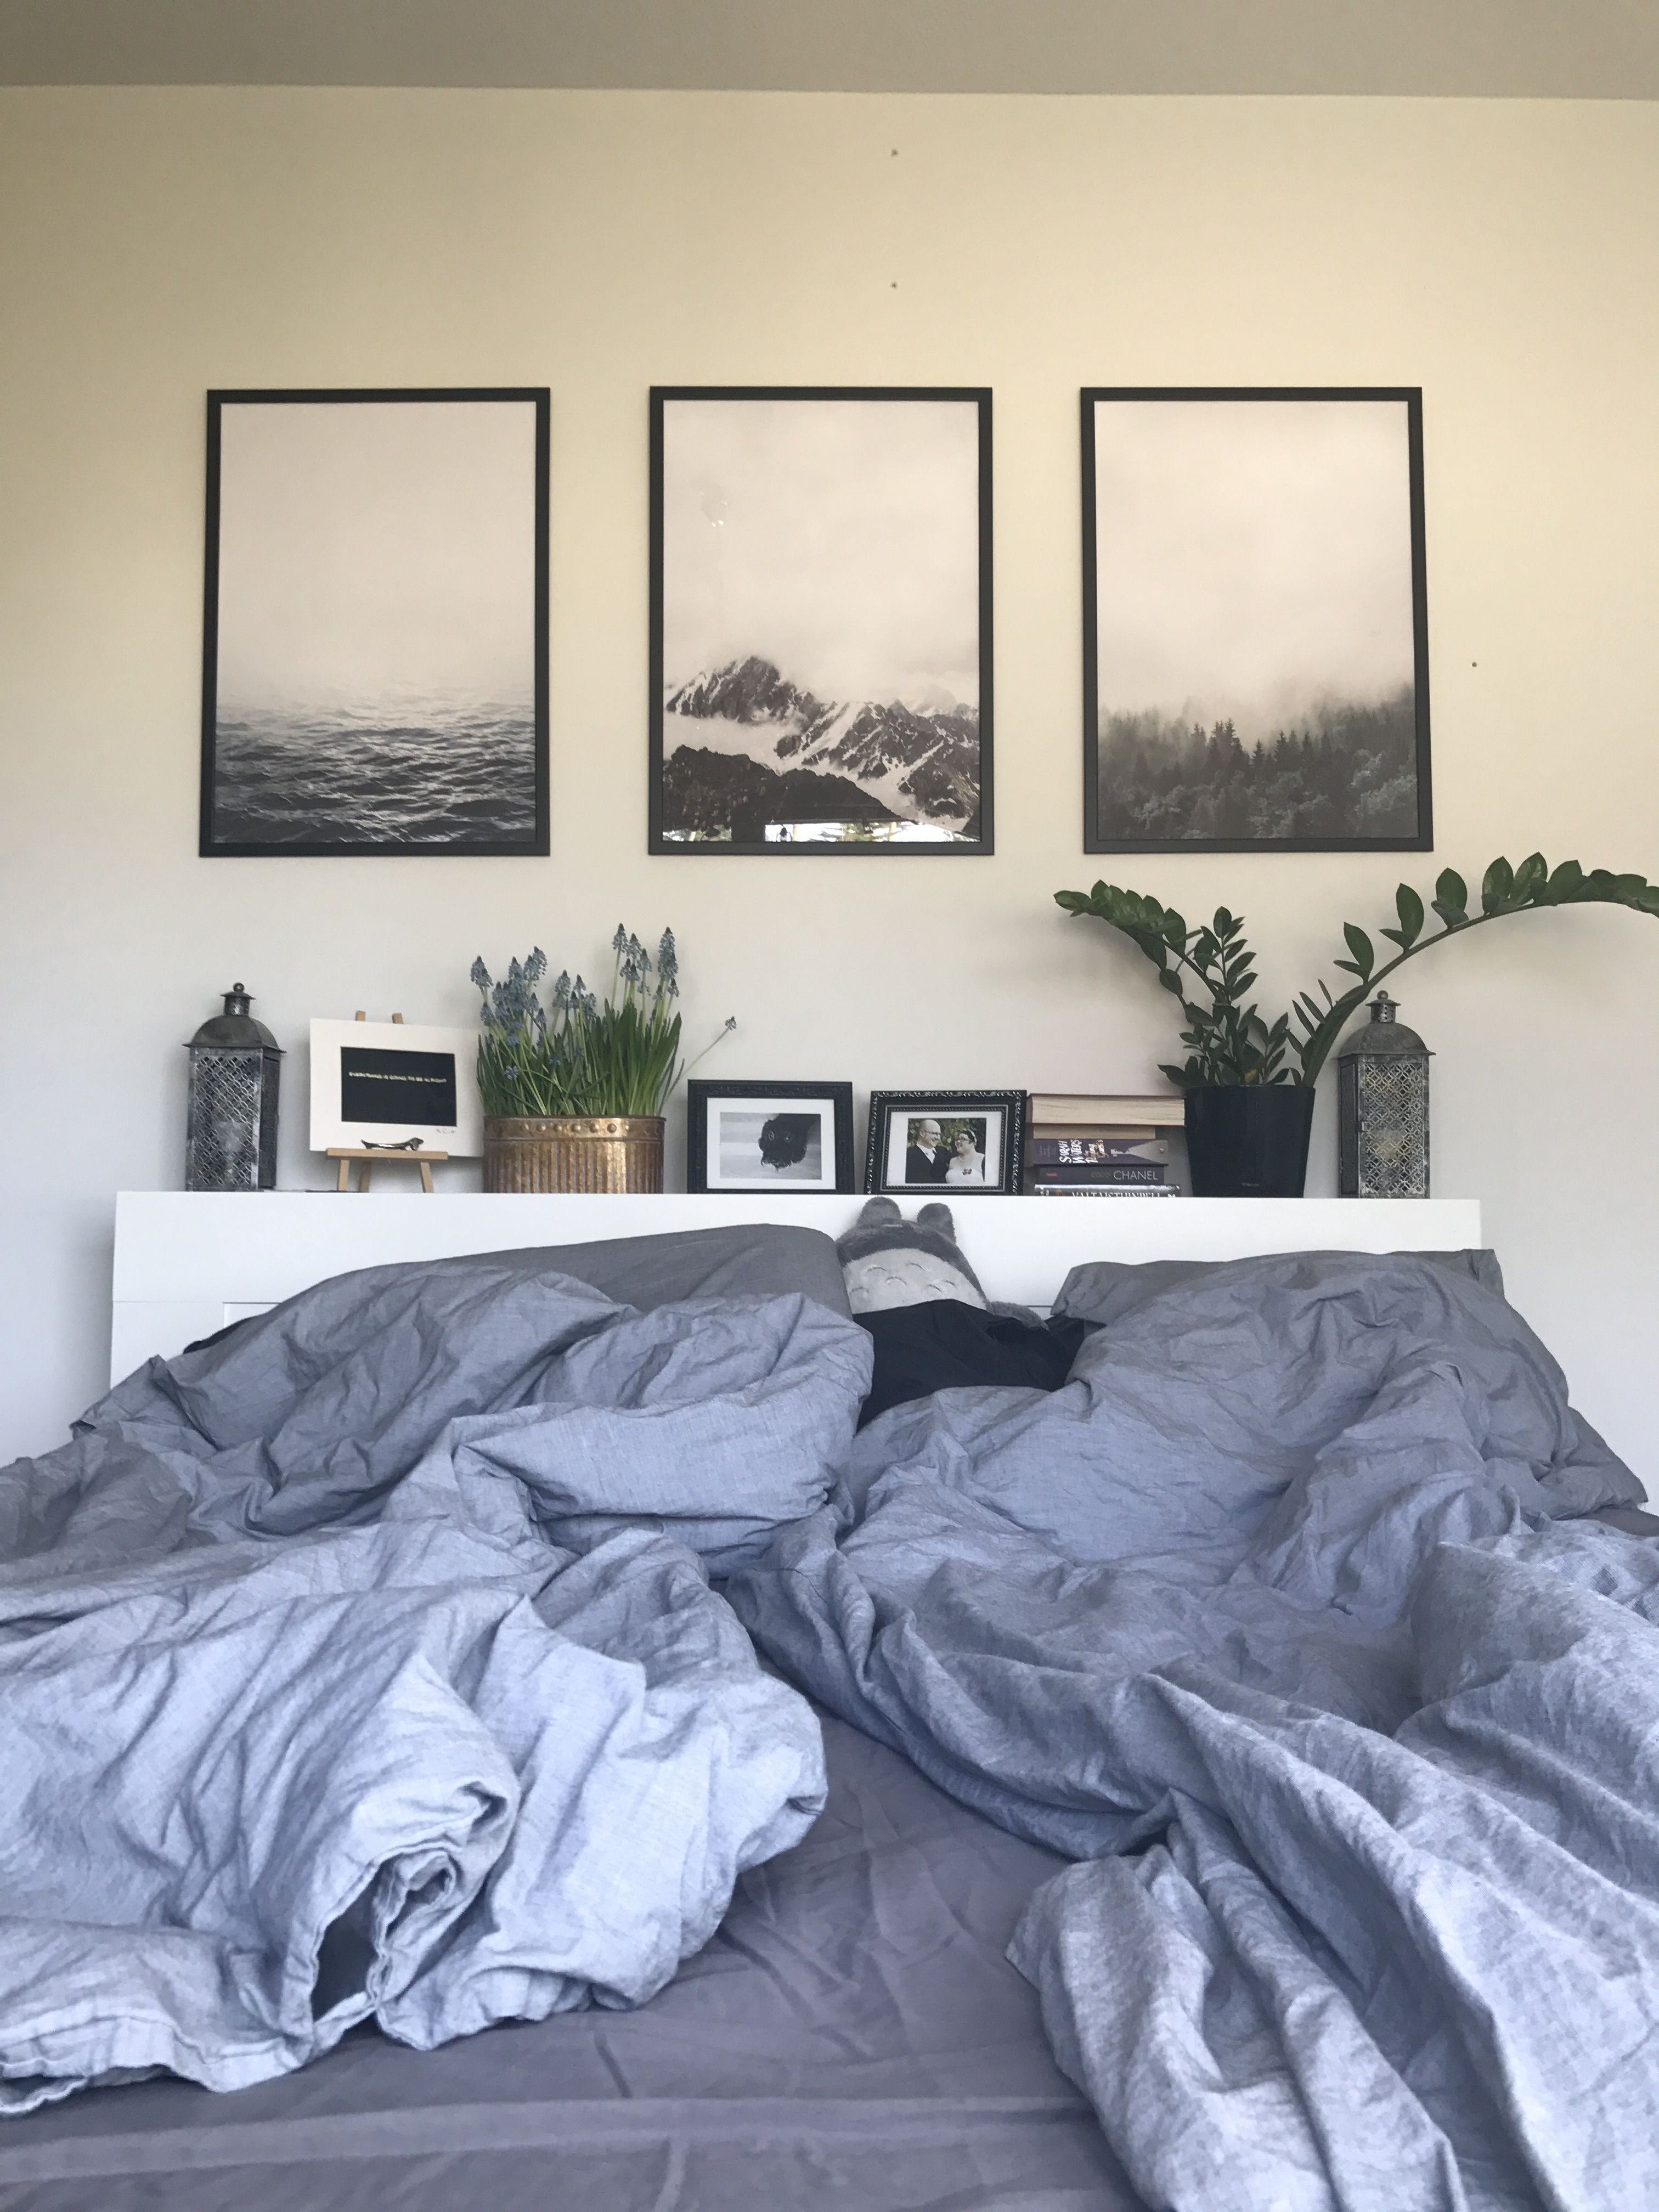 Regal Am Bett Kopfende Einrichtungsideen Schlafzimmer